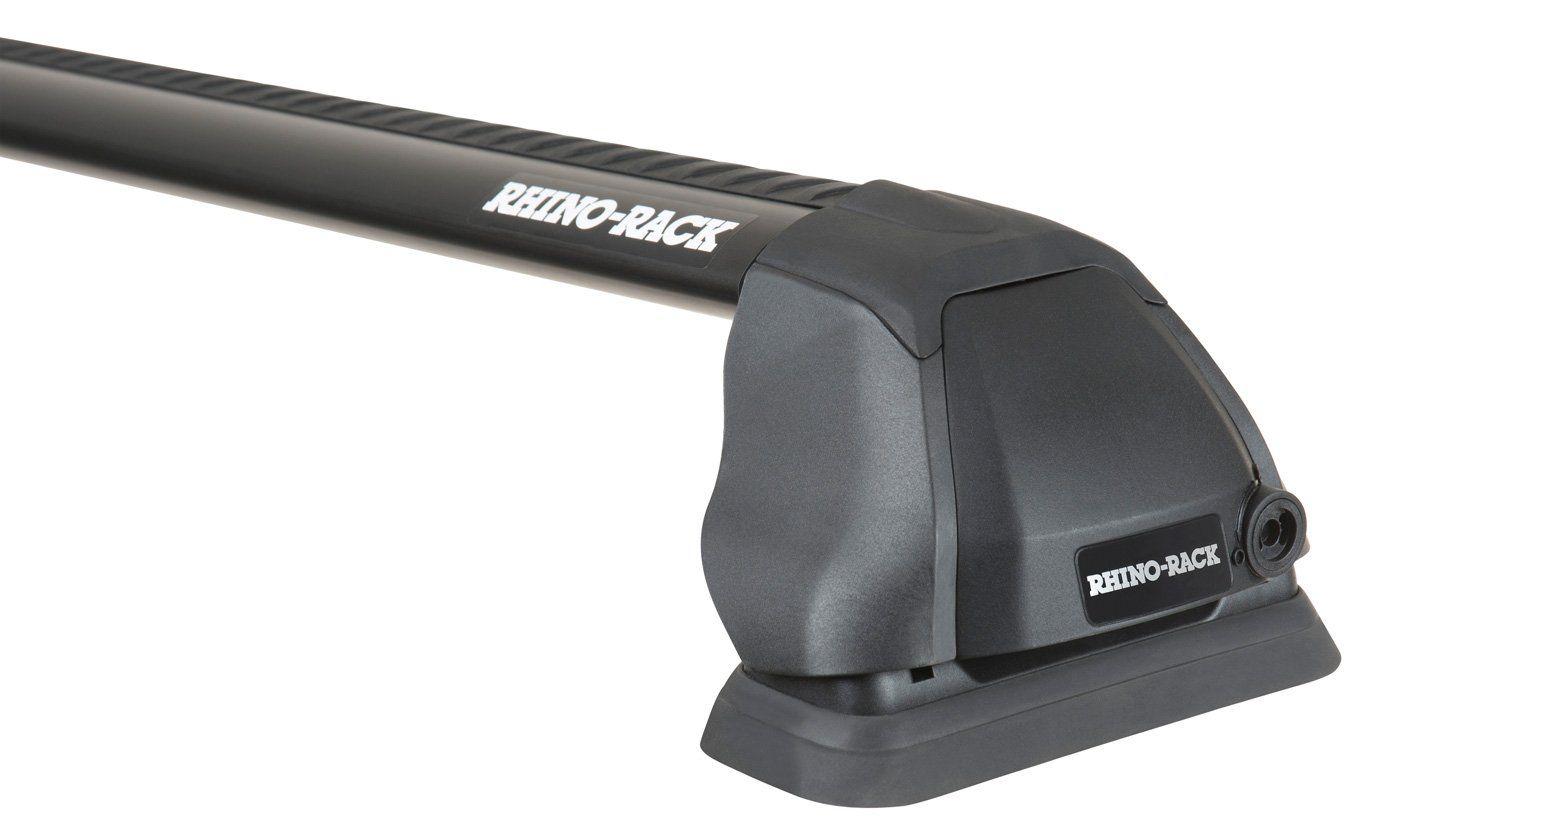 Rhino Rack Rs680b 2500 Rs Fmp 2 Bar Roof Rack Black Roof Rack Volkswagen Passat Toyota Prius